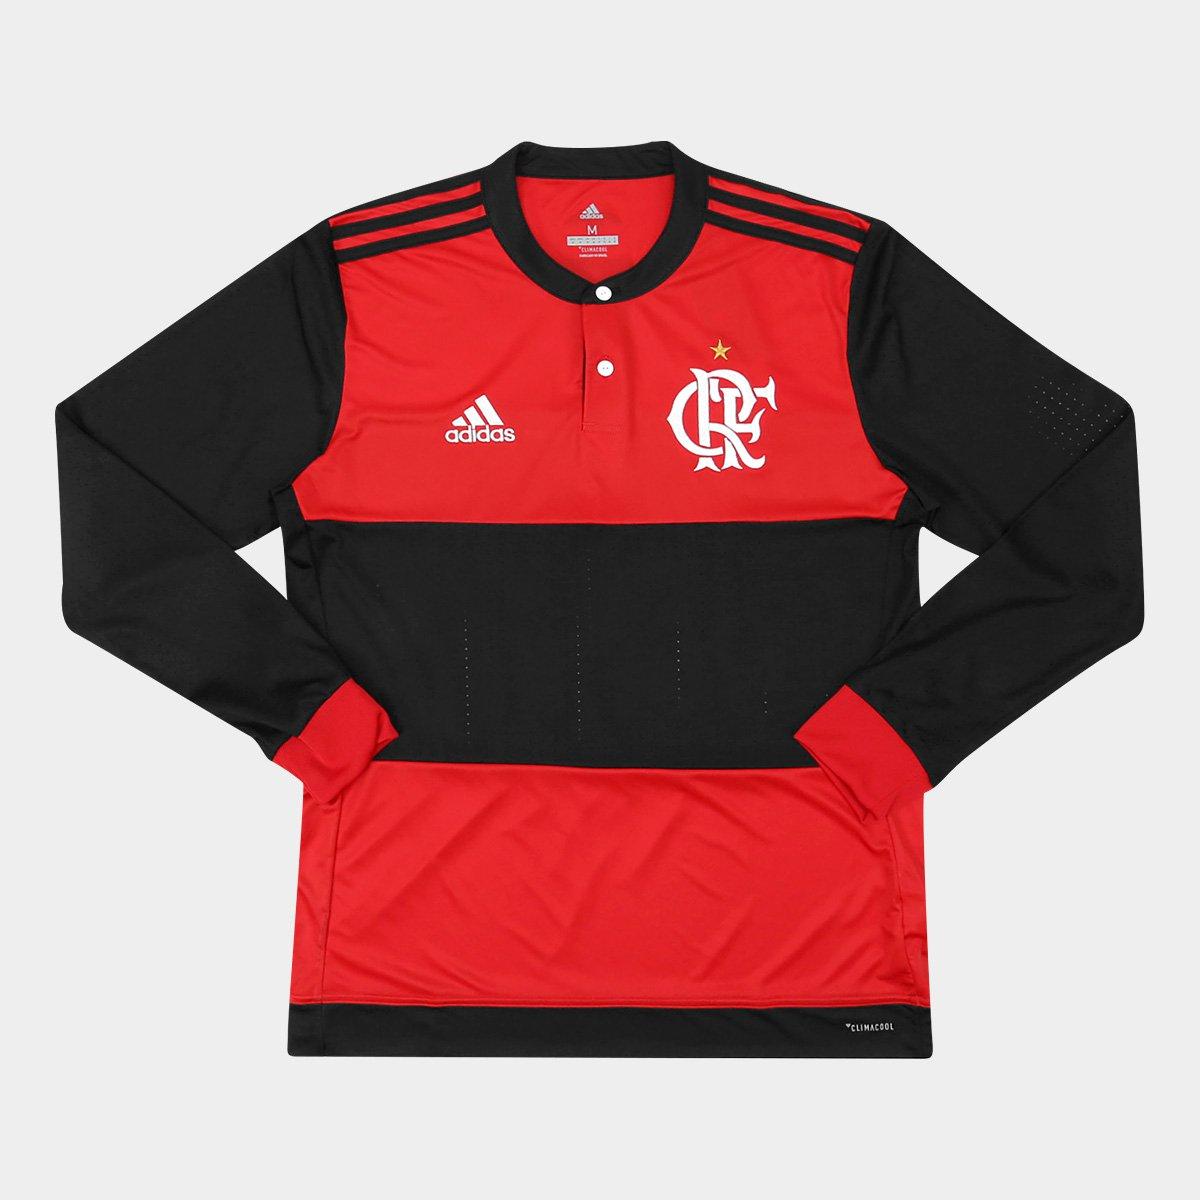 110dc50958ee6 Camisa Flamengo I 17 18 s nº Manga Longa - Torcedor Adidas Masculina -  Compre Agora